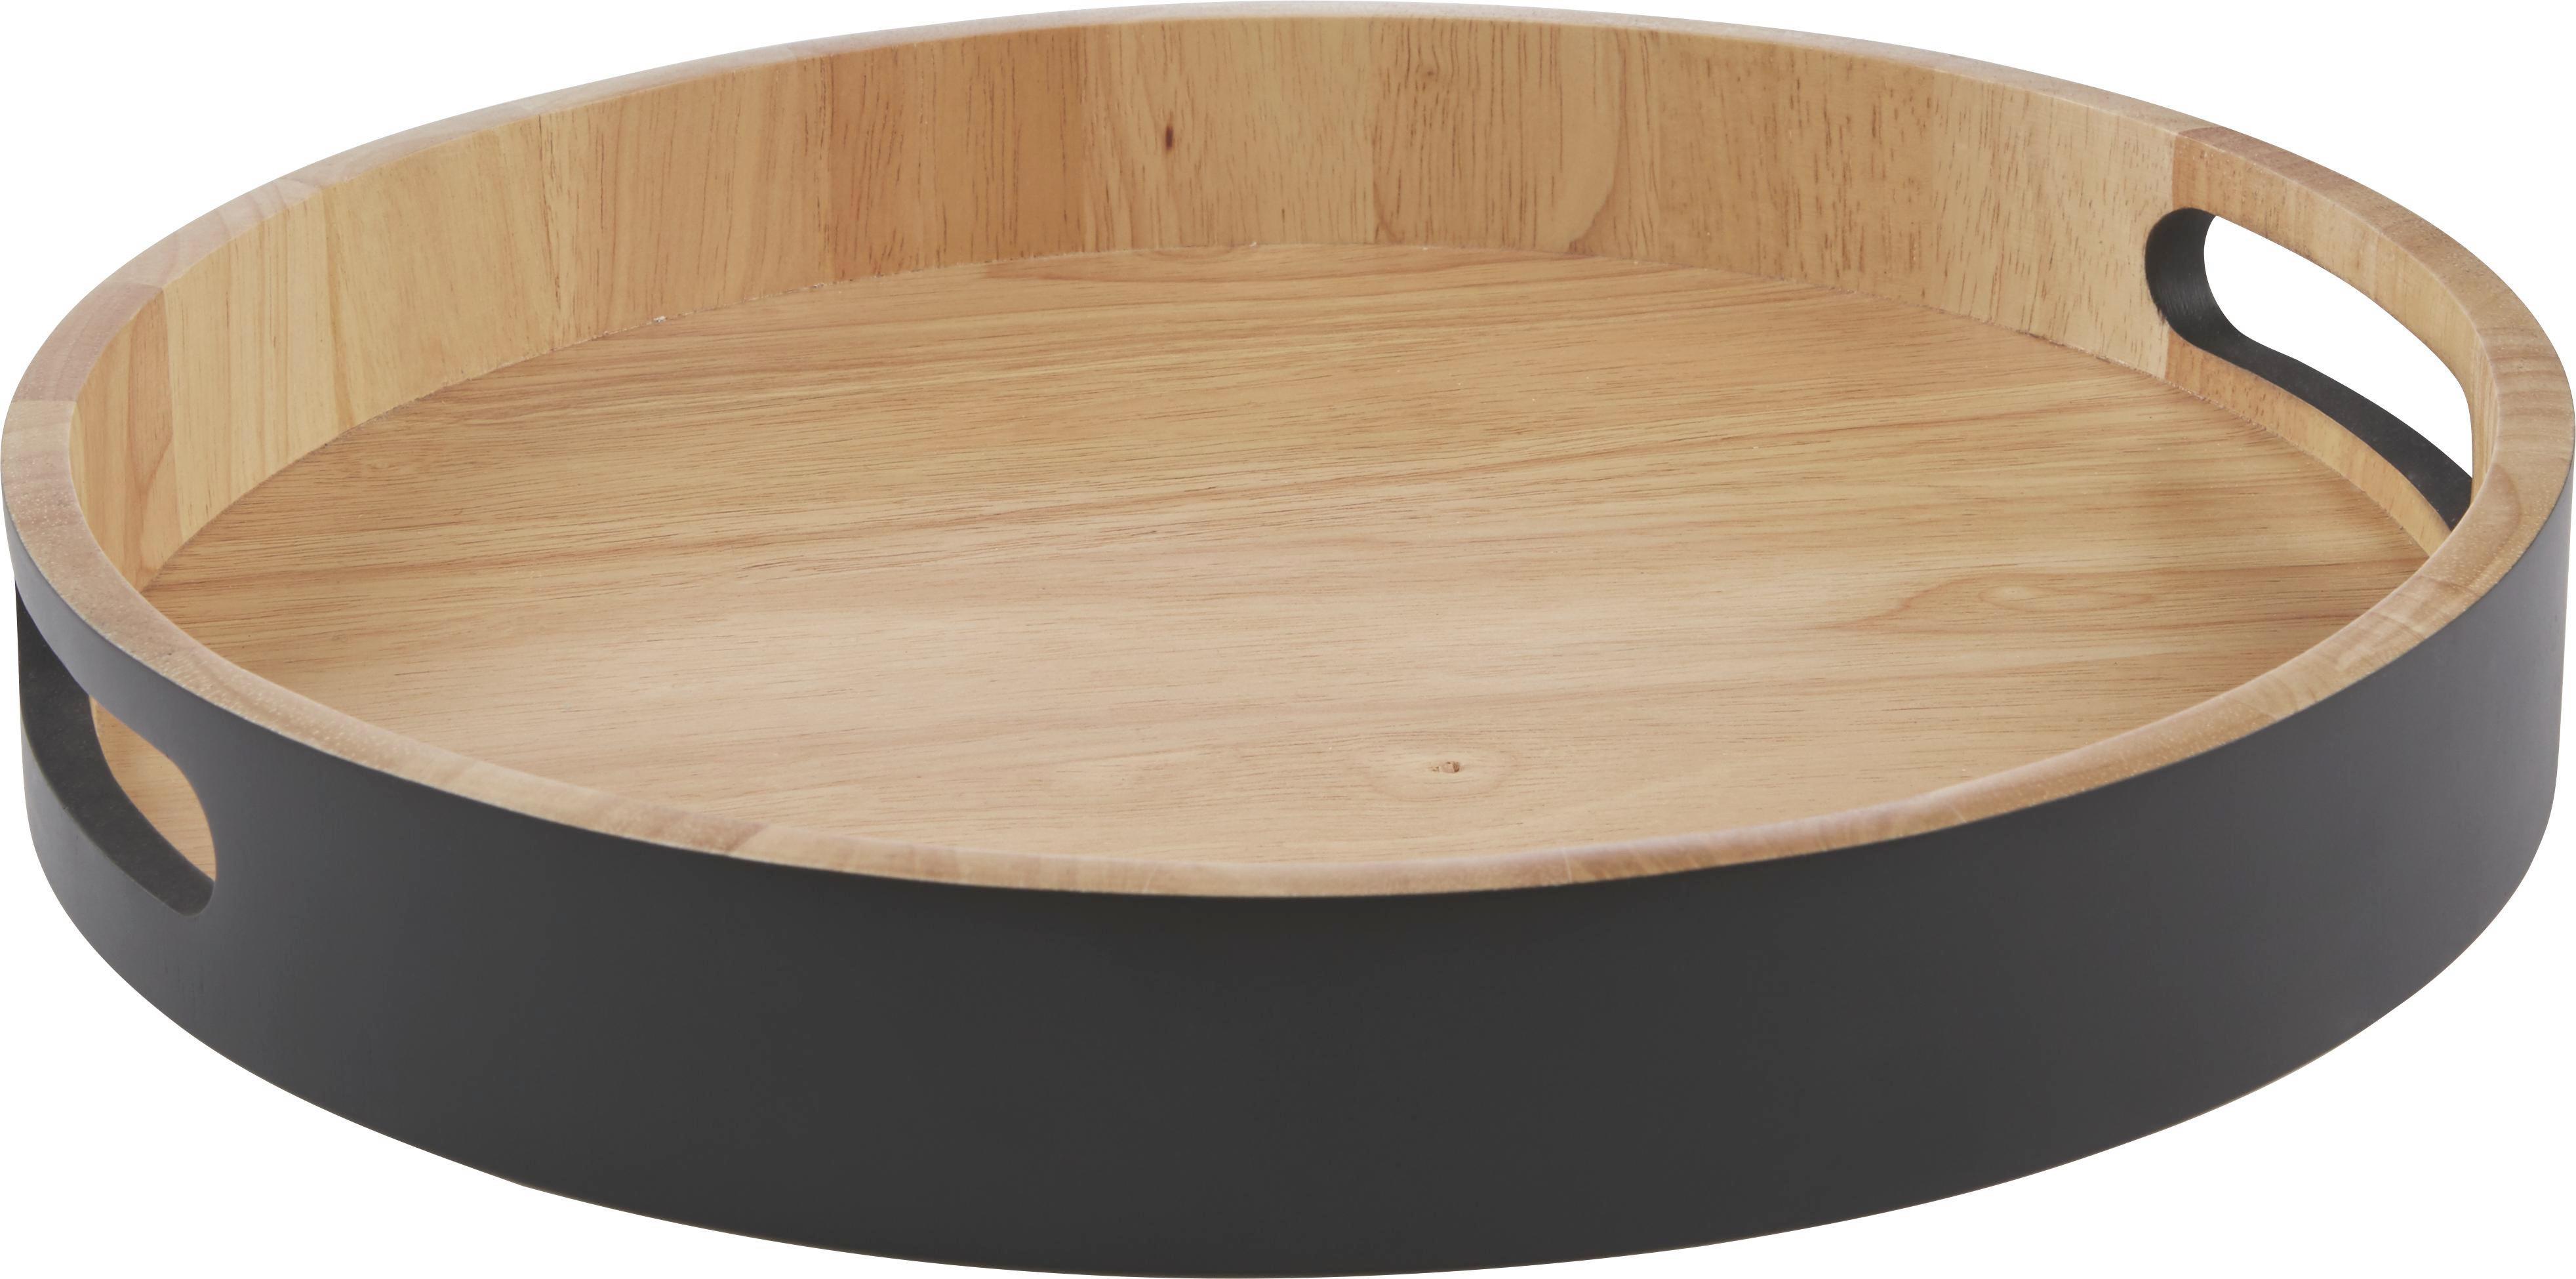 Tálca Sirikit - natúr színek/fekete, Lifestyle, fa (35/5cm) - MÖMAX modern living